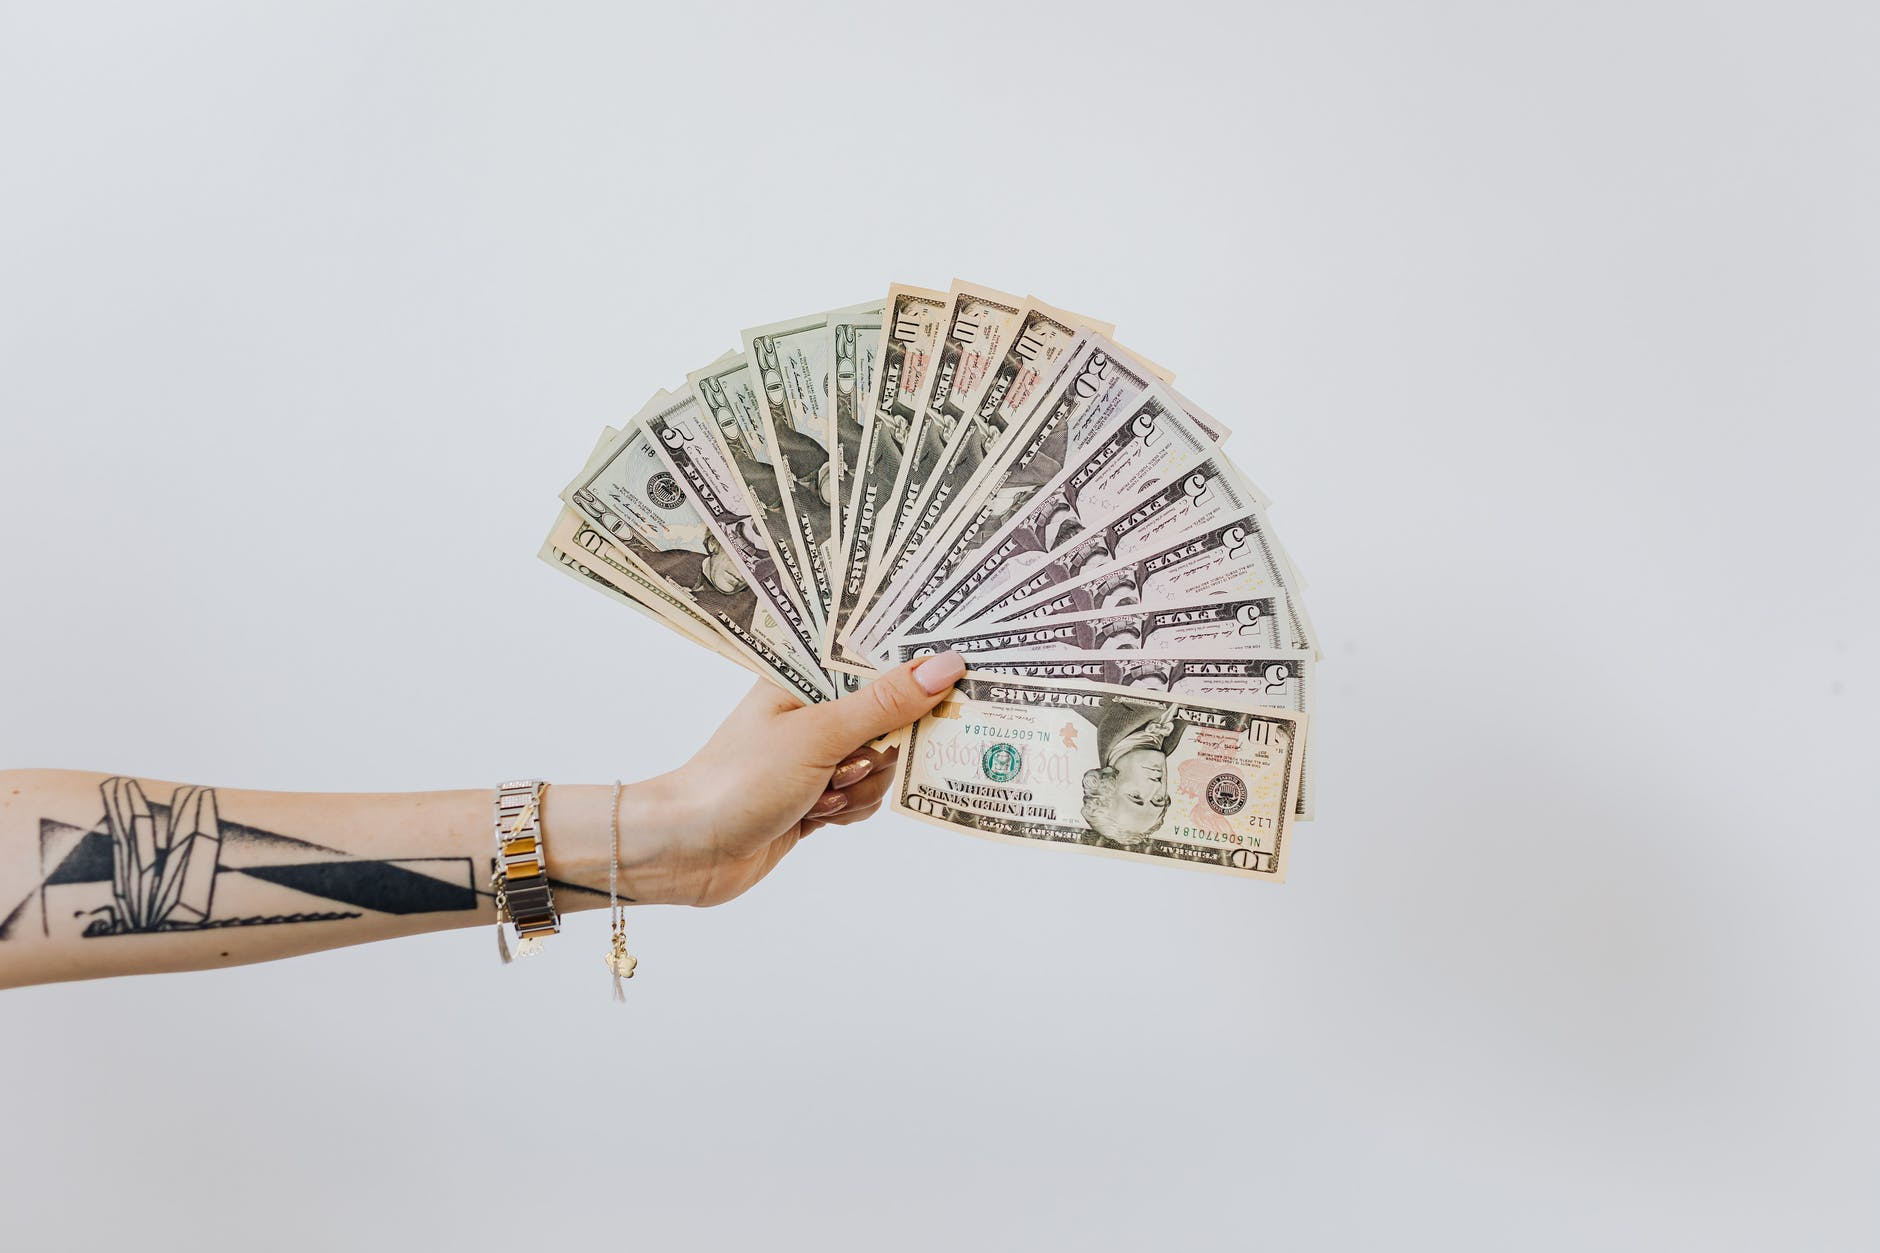 americké dolary v ruc